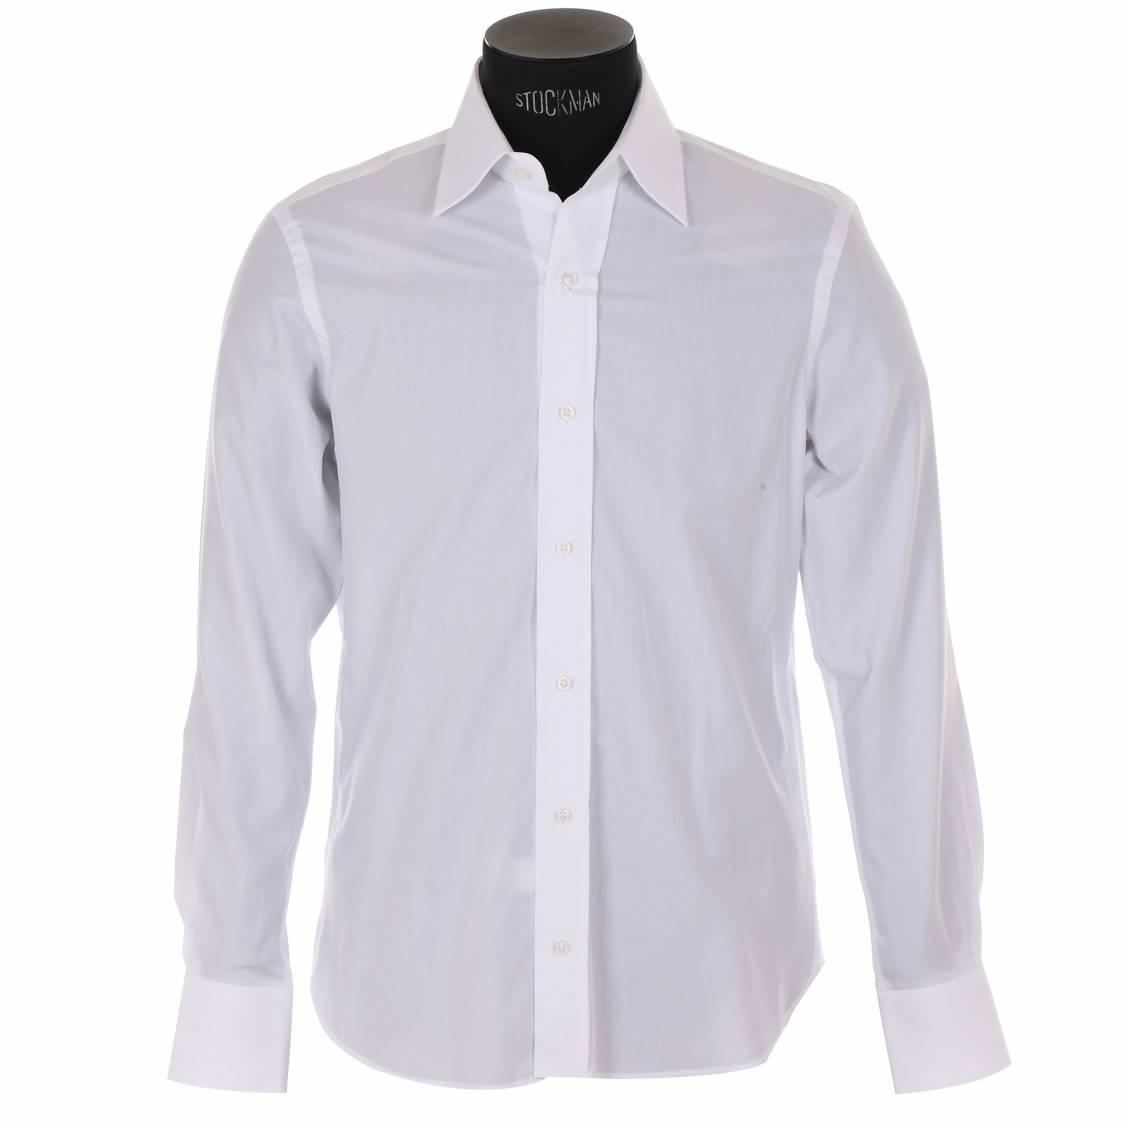 chemise homme cotton park ajust e en popeline blanche. Black Bedroom Furniture Sets. Home Design Ideas